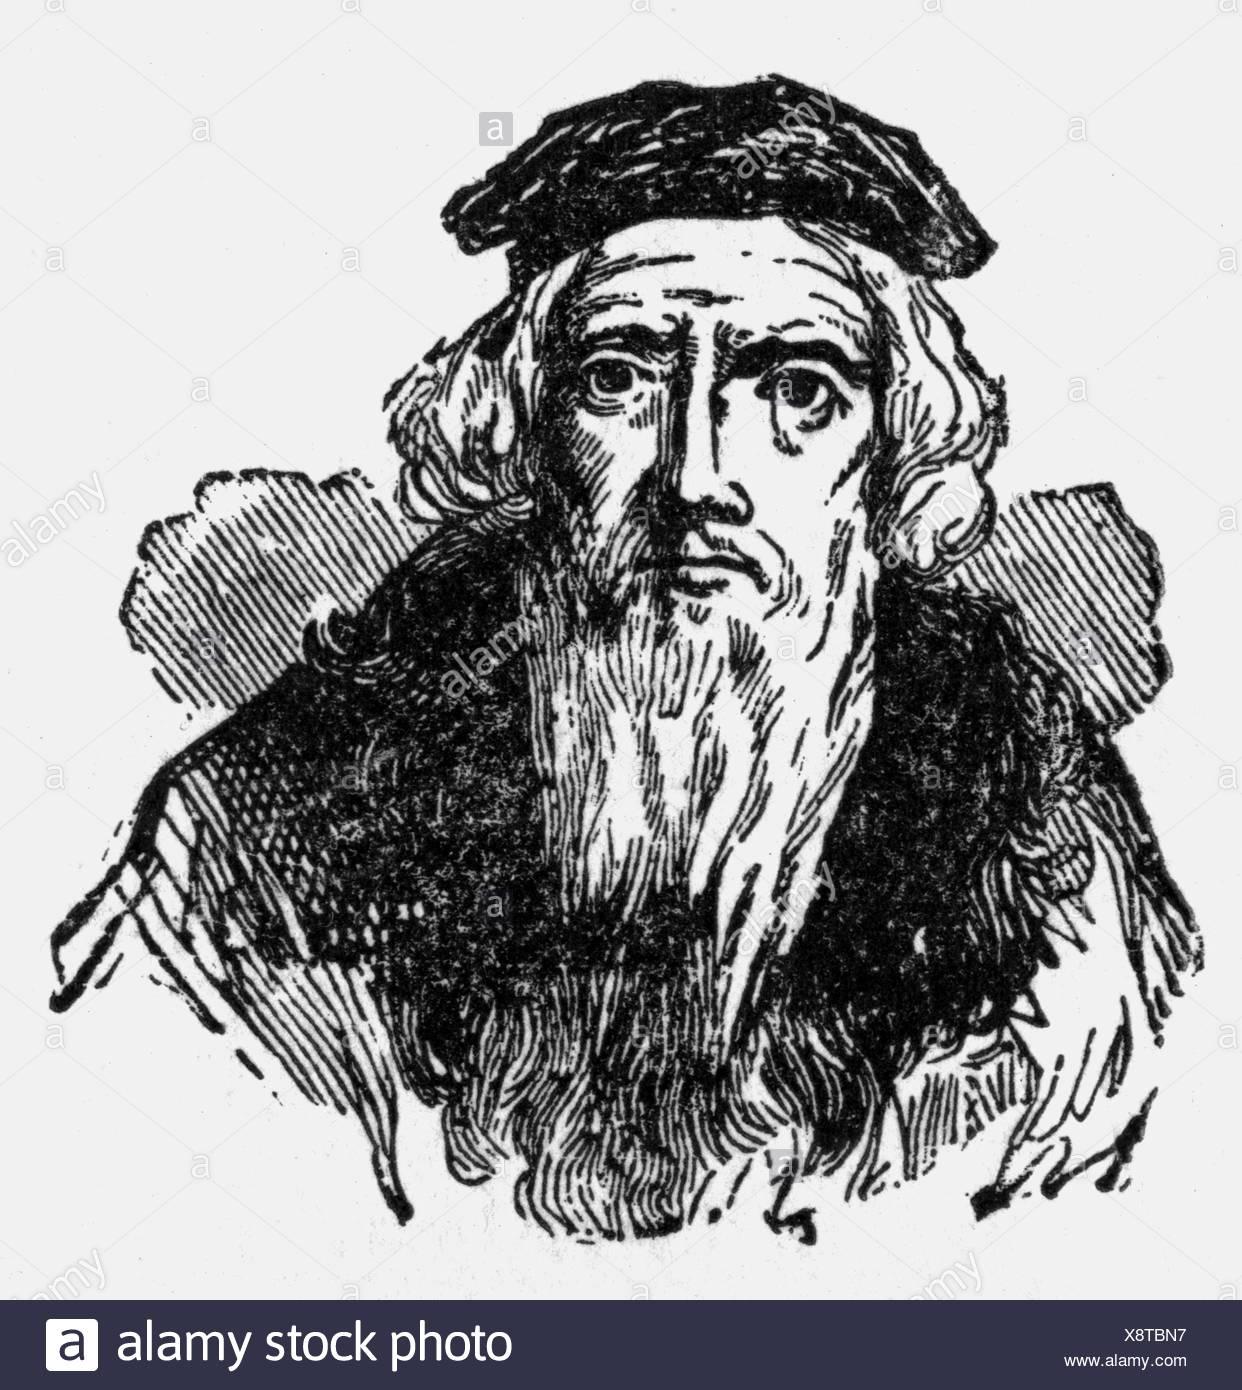 Cabot, Sebastian (Caboto), 1472/1884 - 1557, Italian navigator, explorer, portrait, Additional-Rights-Clearances-NA - Stock Image